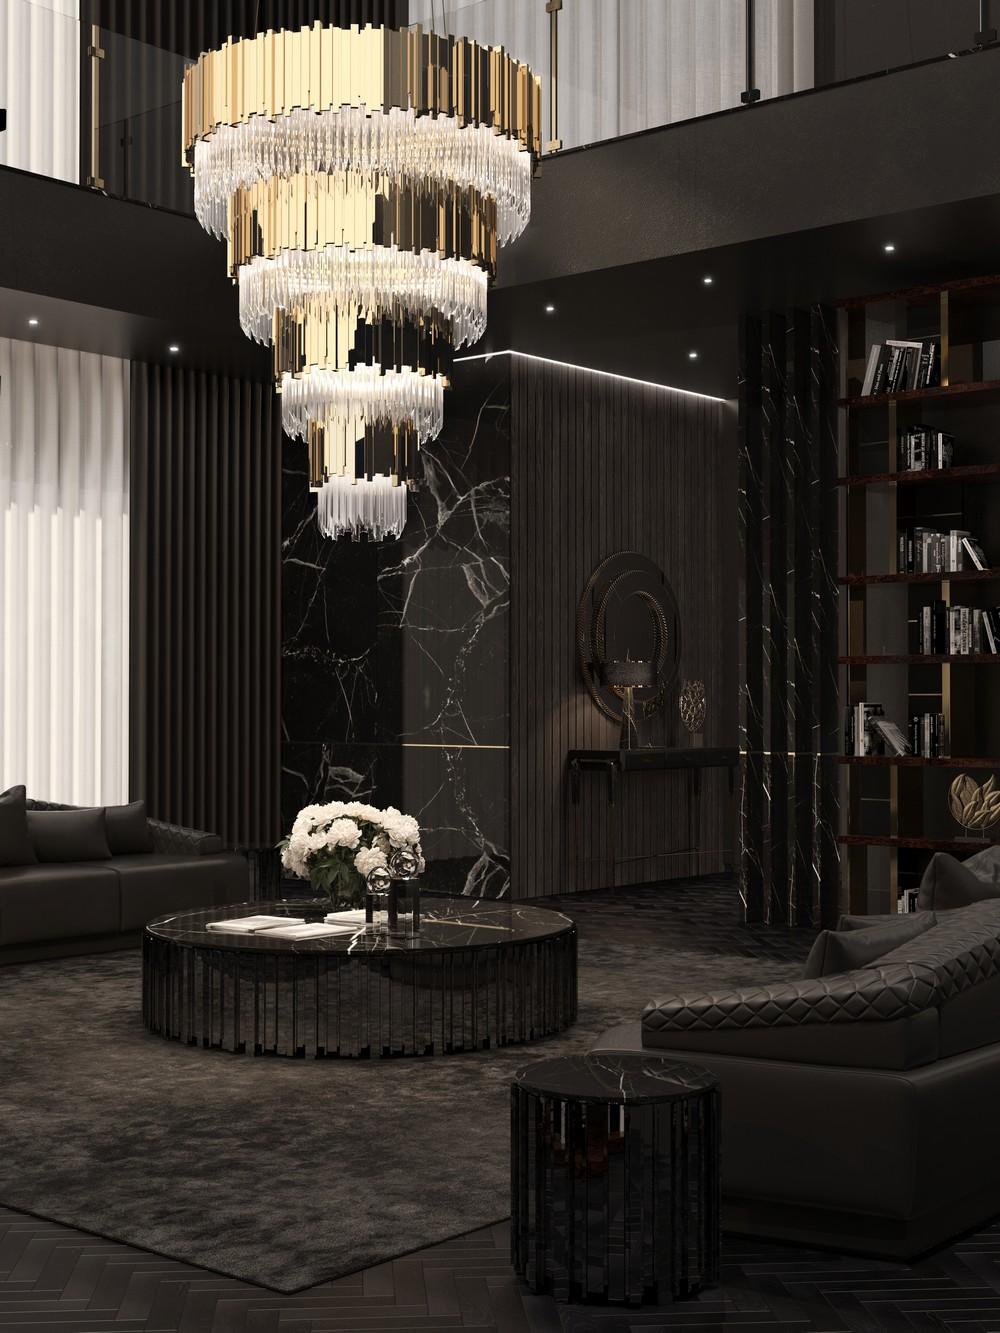 Interior Design Ideas on How to Make Darker Interiors Brighter 2 interior design ideas Interior Design Ideas on How to Make Darker Interiors Brighter Interior Design Ideas on How to Make Darker Interiors Brighter 2